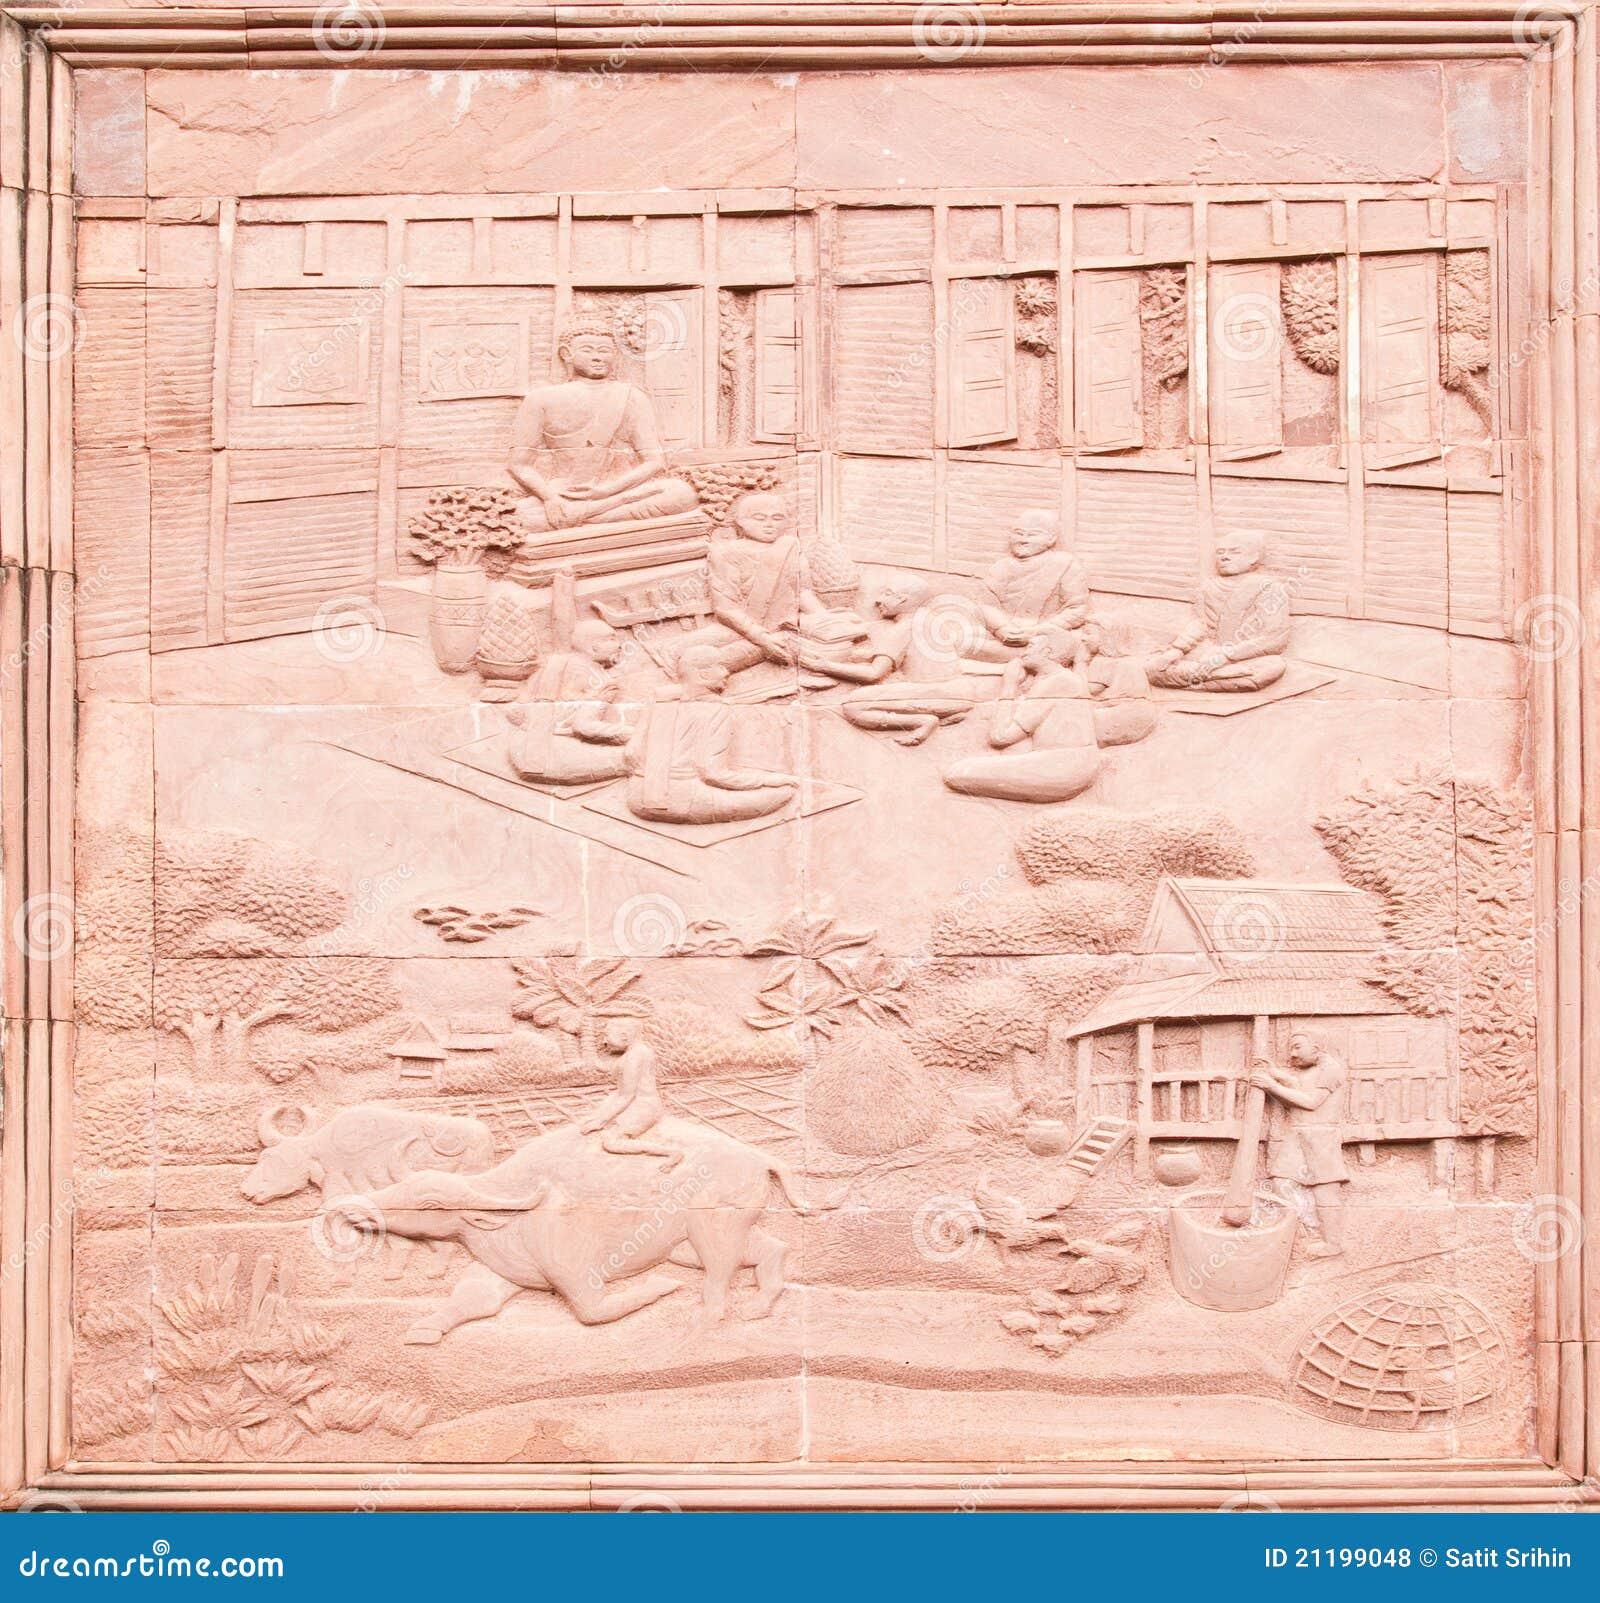 Native Thai art on low relief sculpture